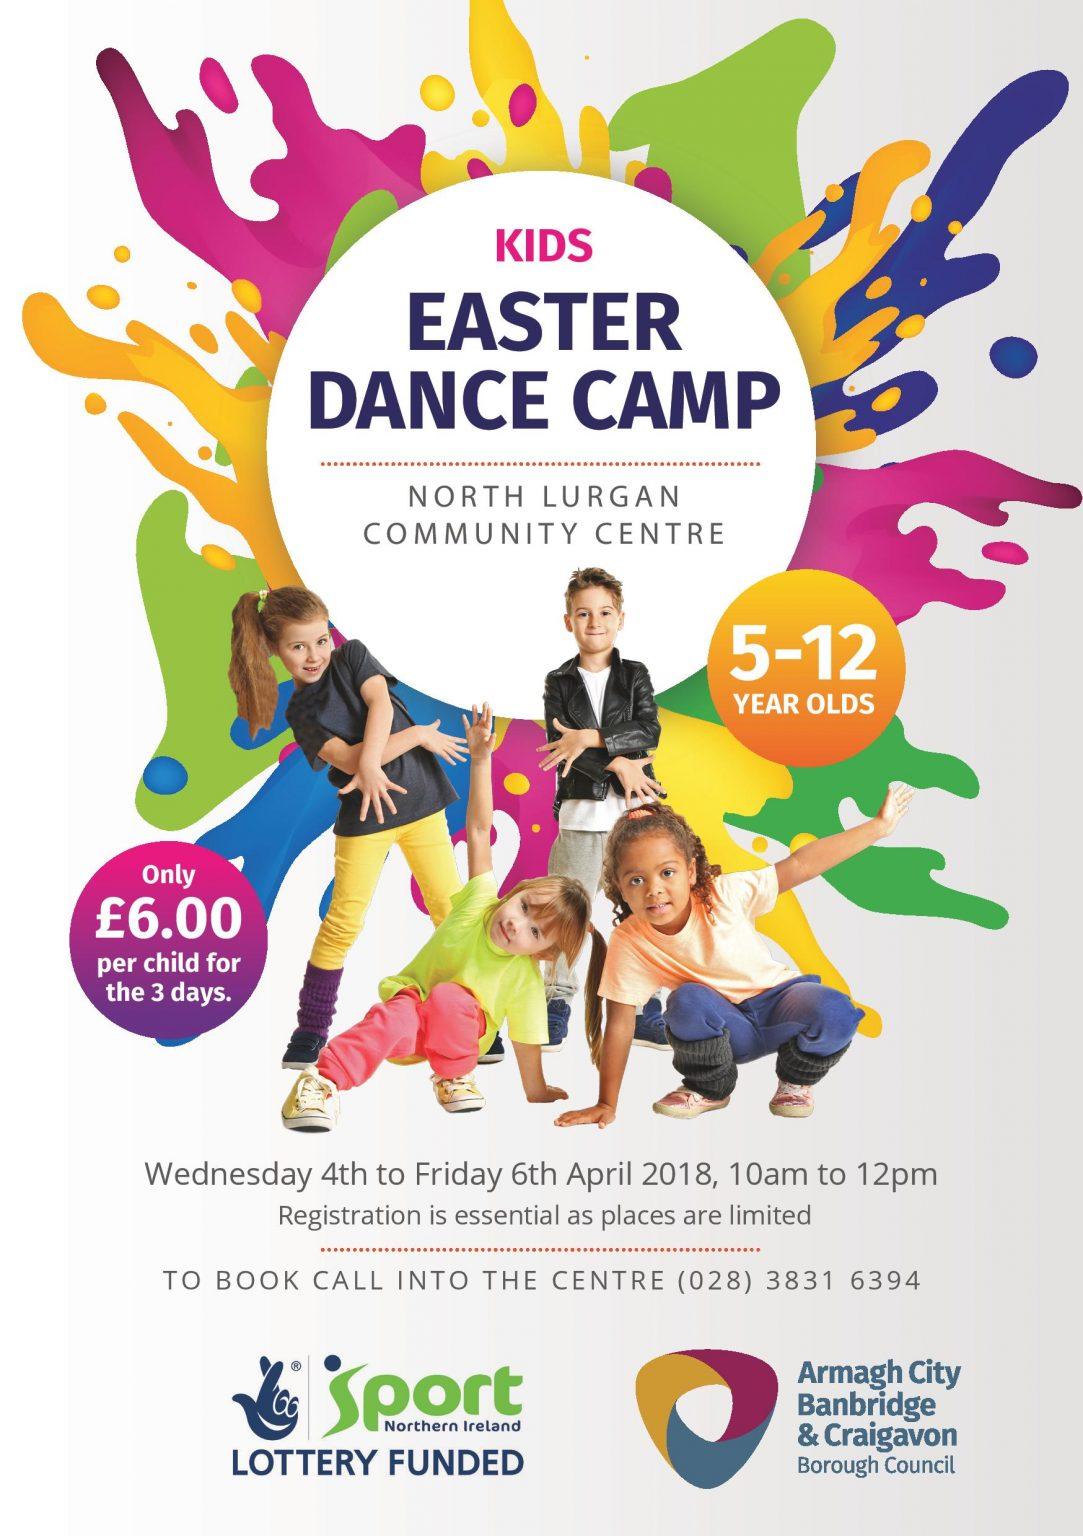 Easter Dance Camp At North Lurgan Community Centre